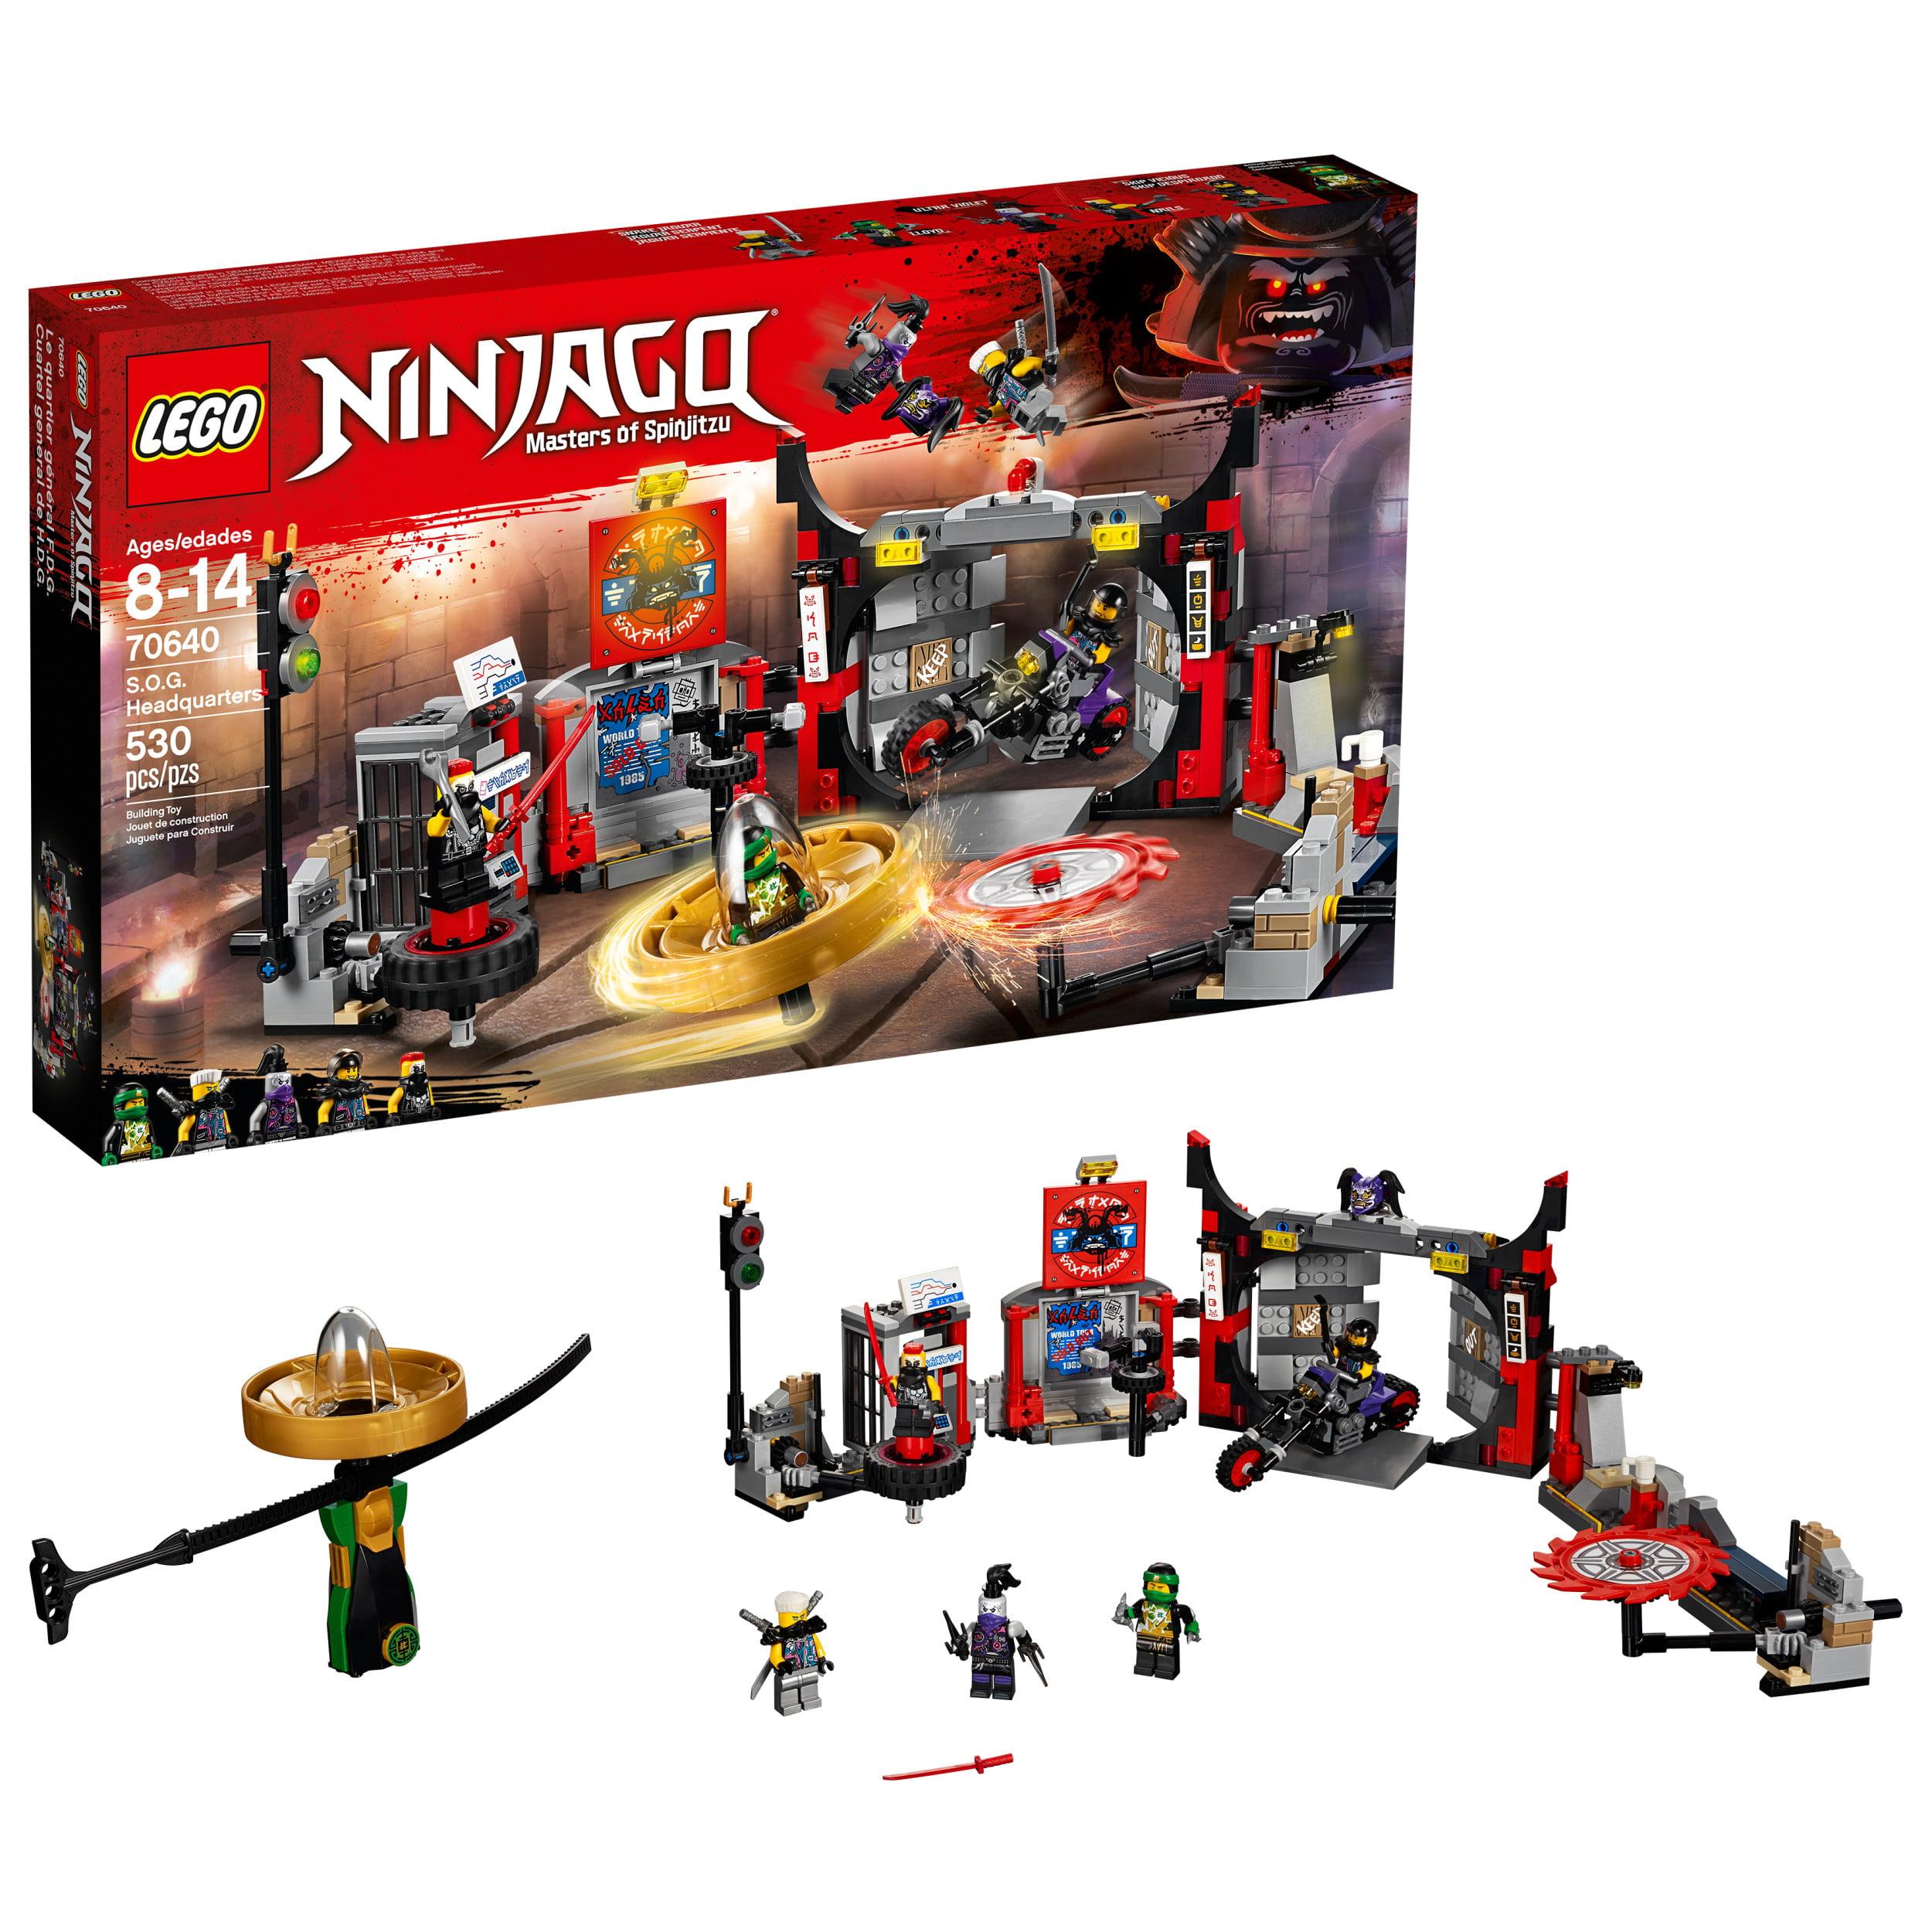 LEGO Ninjago S.O.G. Headquarters 70640 (530 Pieces)